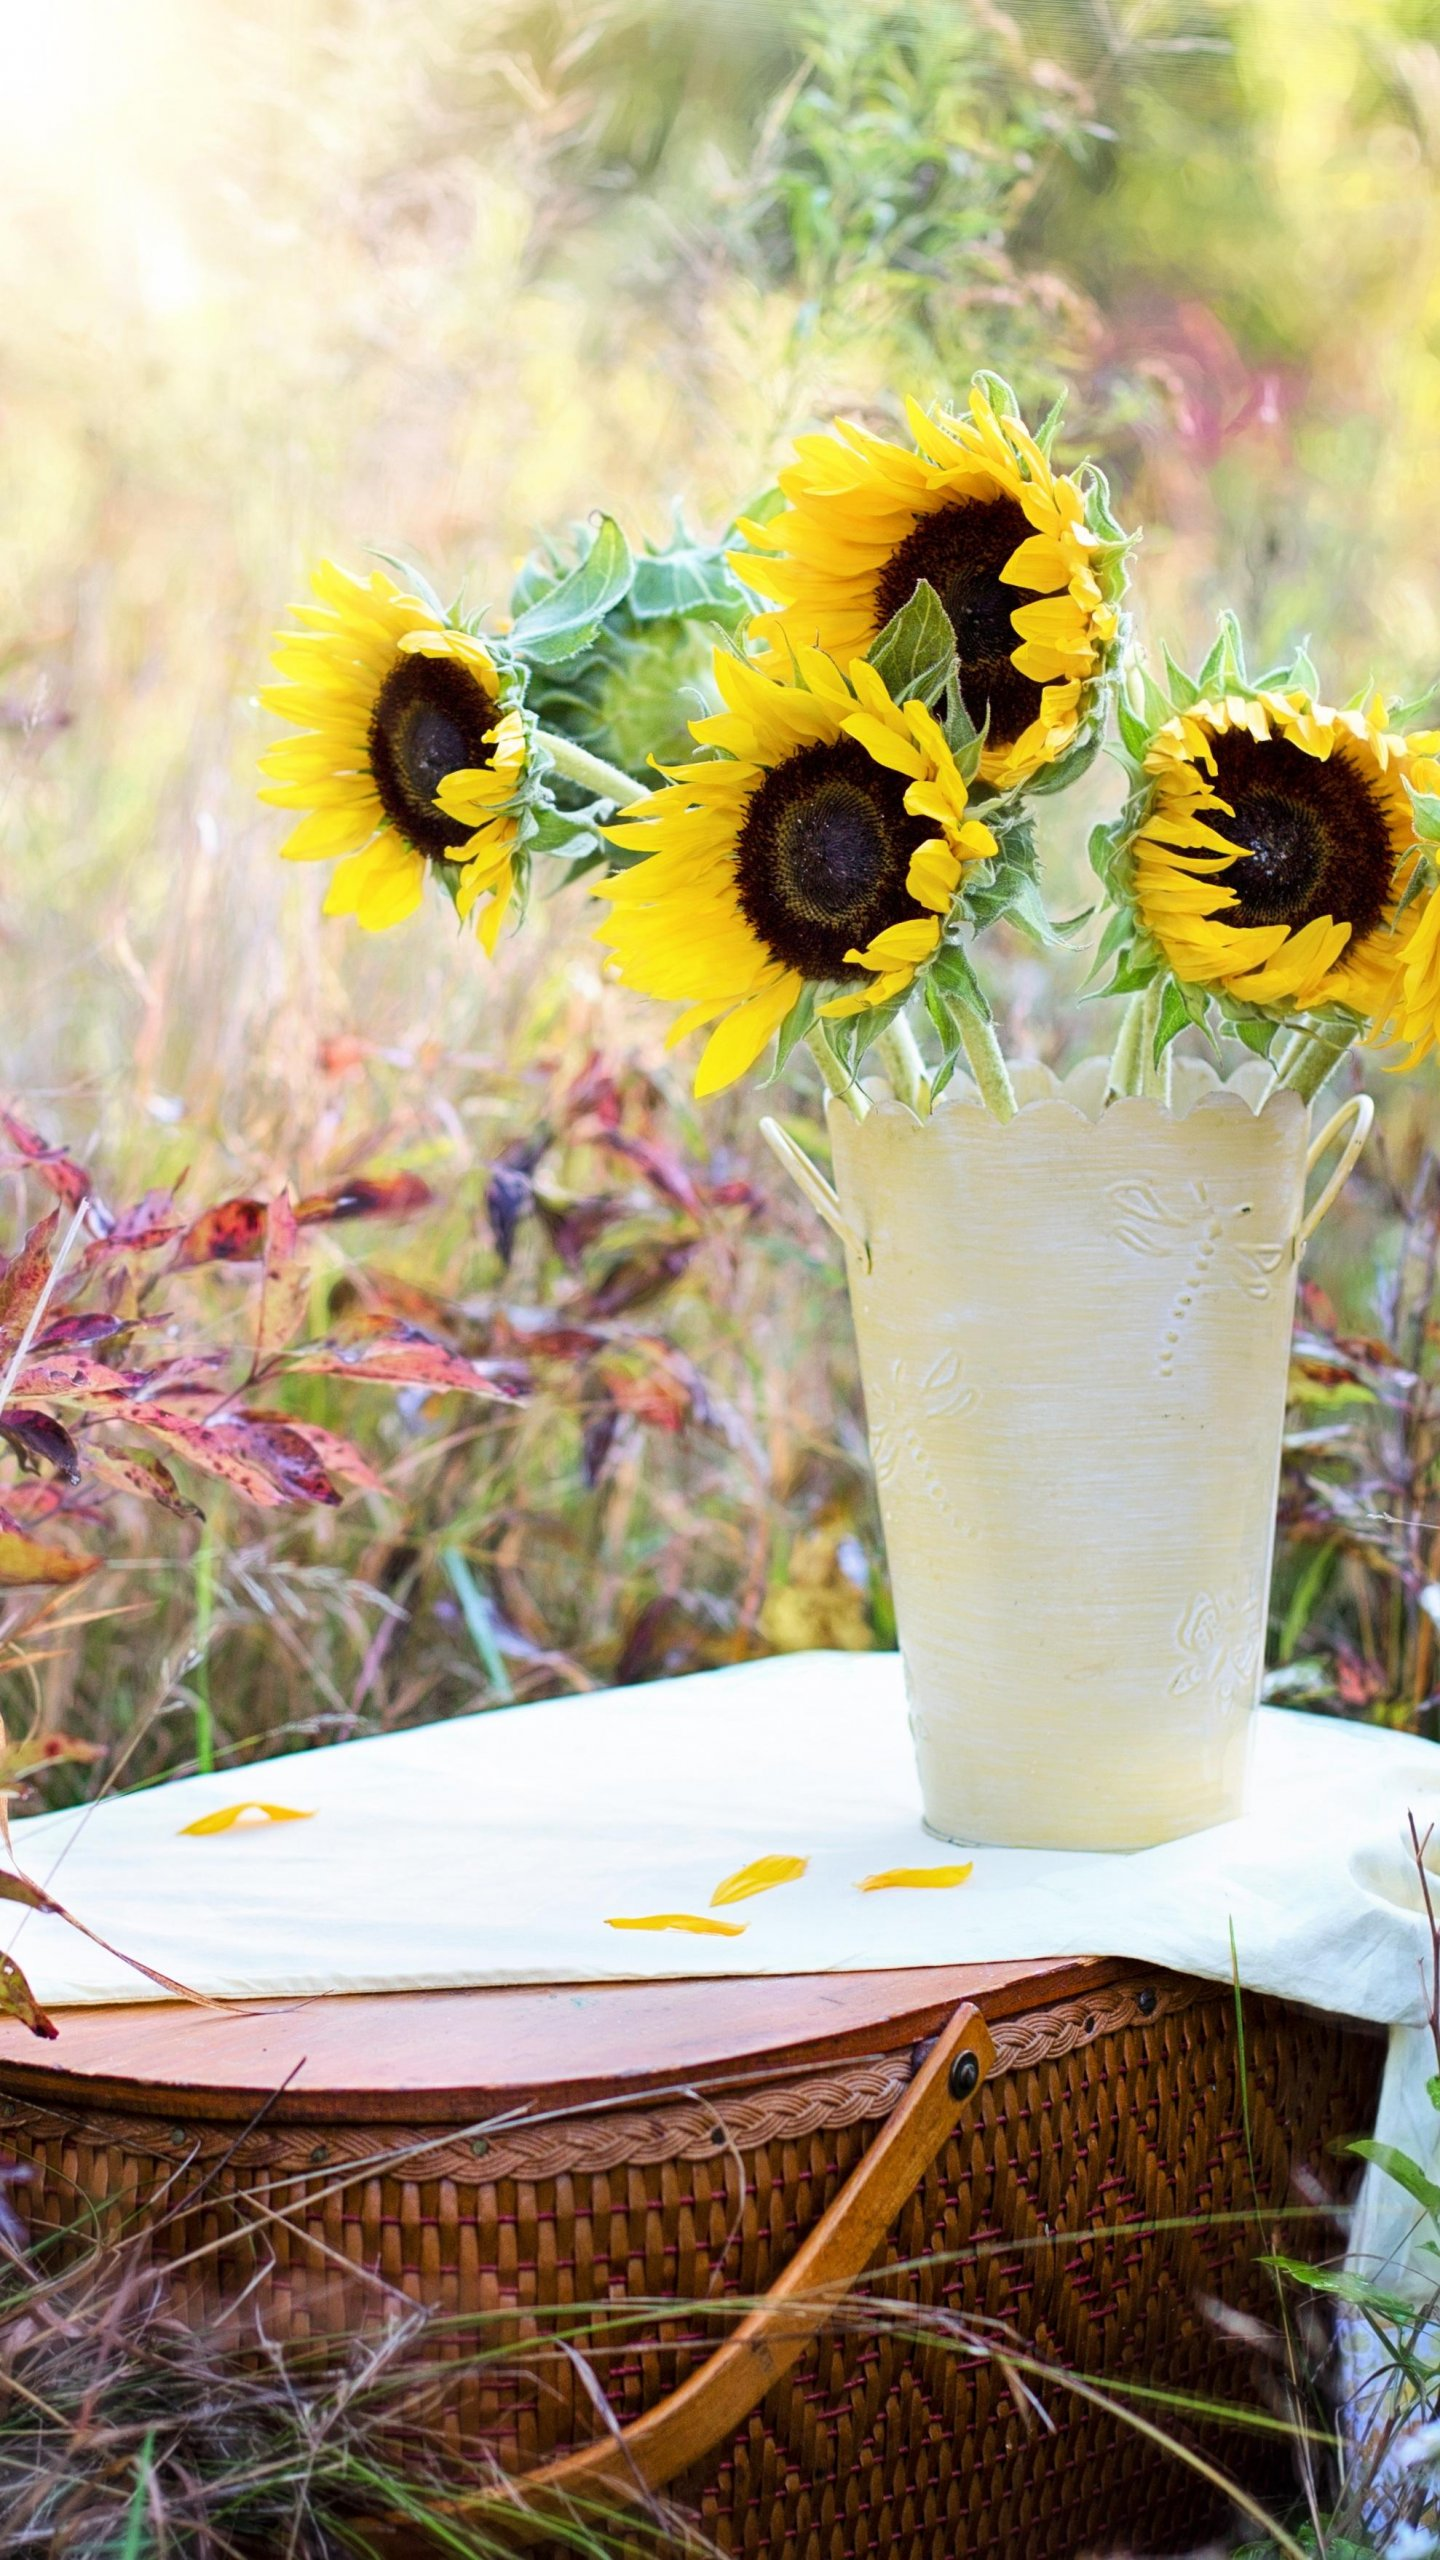 Romantic Picnic Basket Sunflowers Wallpaper Iphone